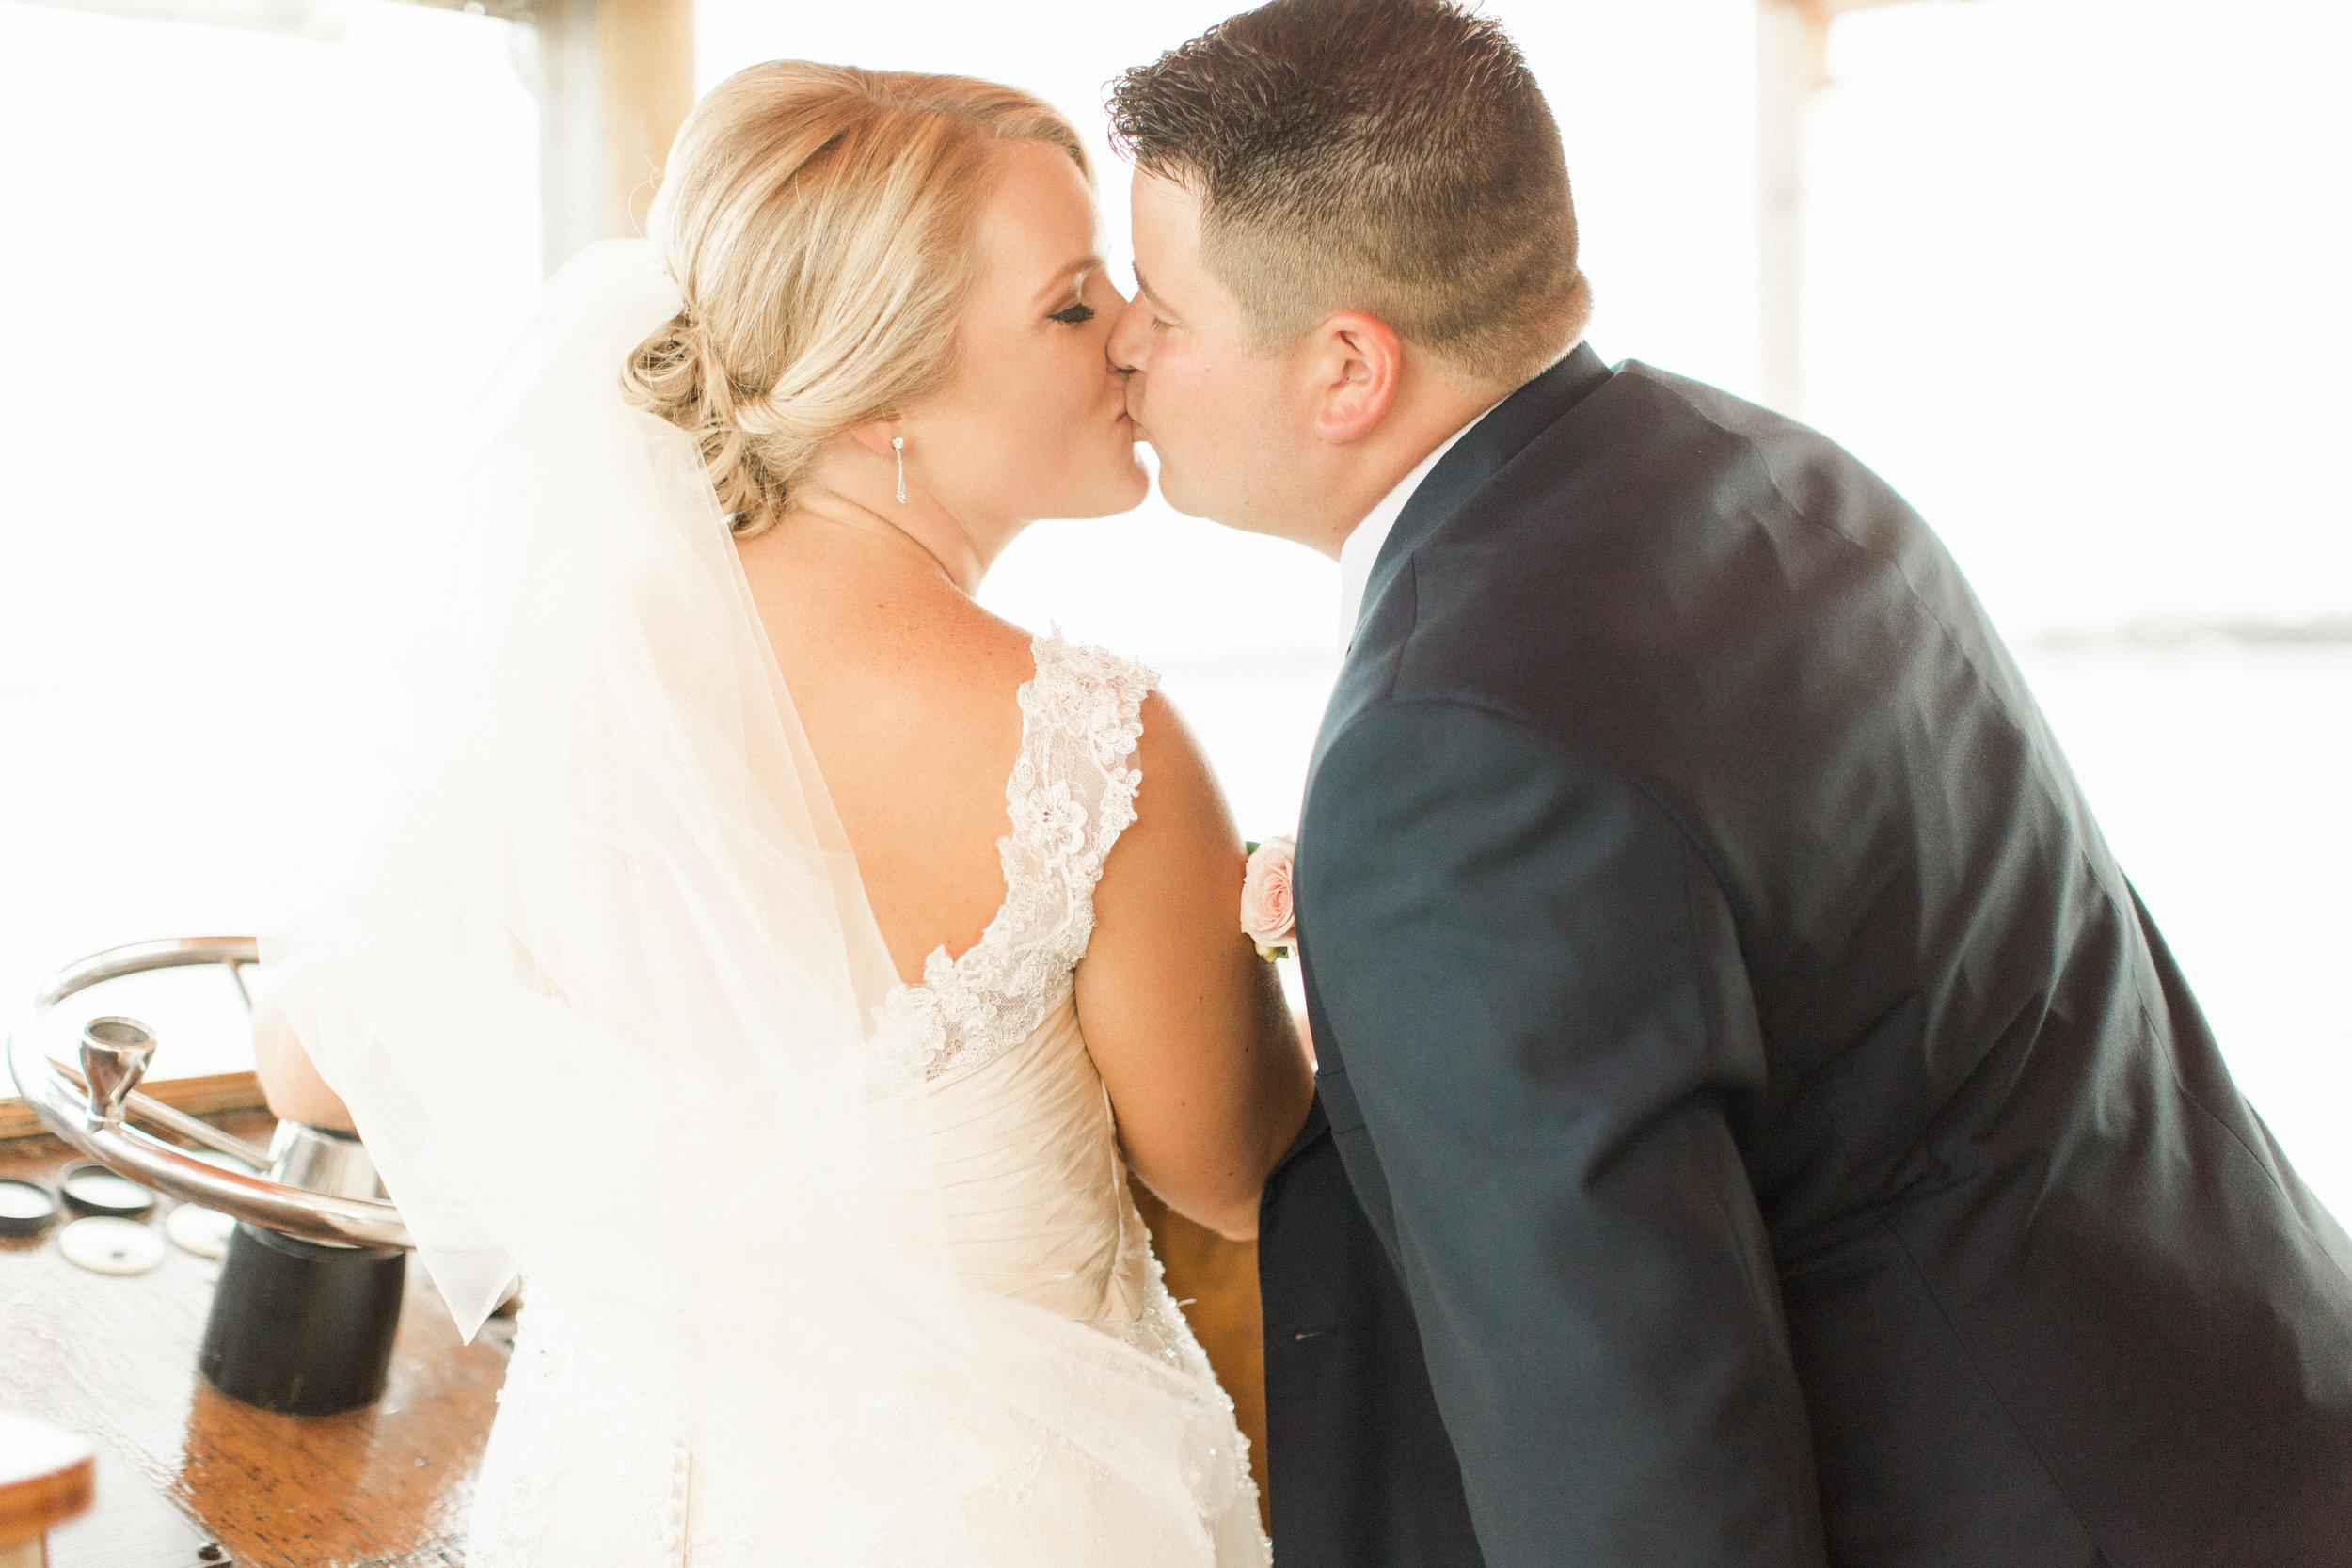 bride-groom-party-boat-kiss-white-veil-beaded-dress-blue-suit